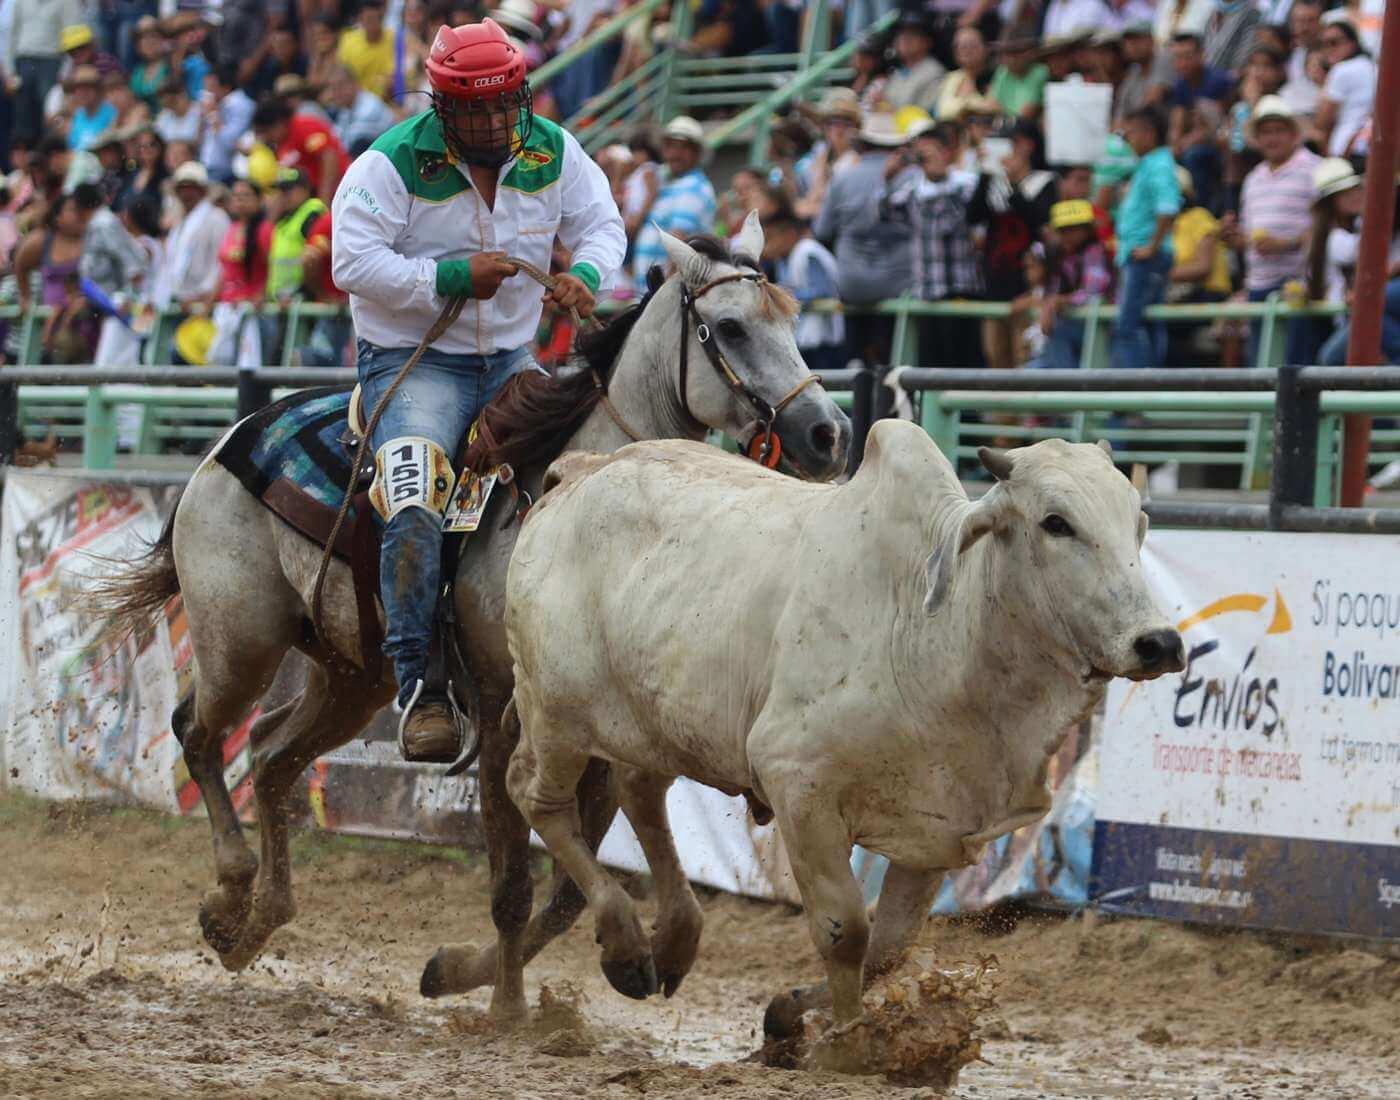 Coleo traditional sport of Venezuela